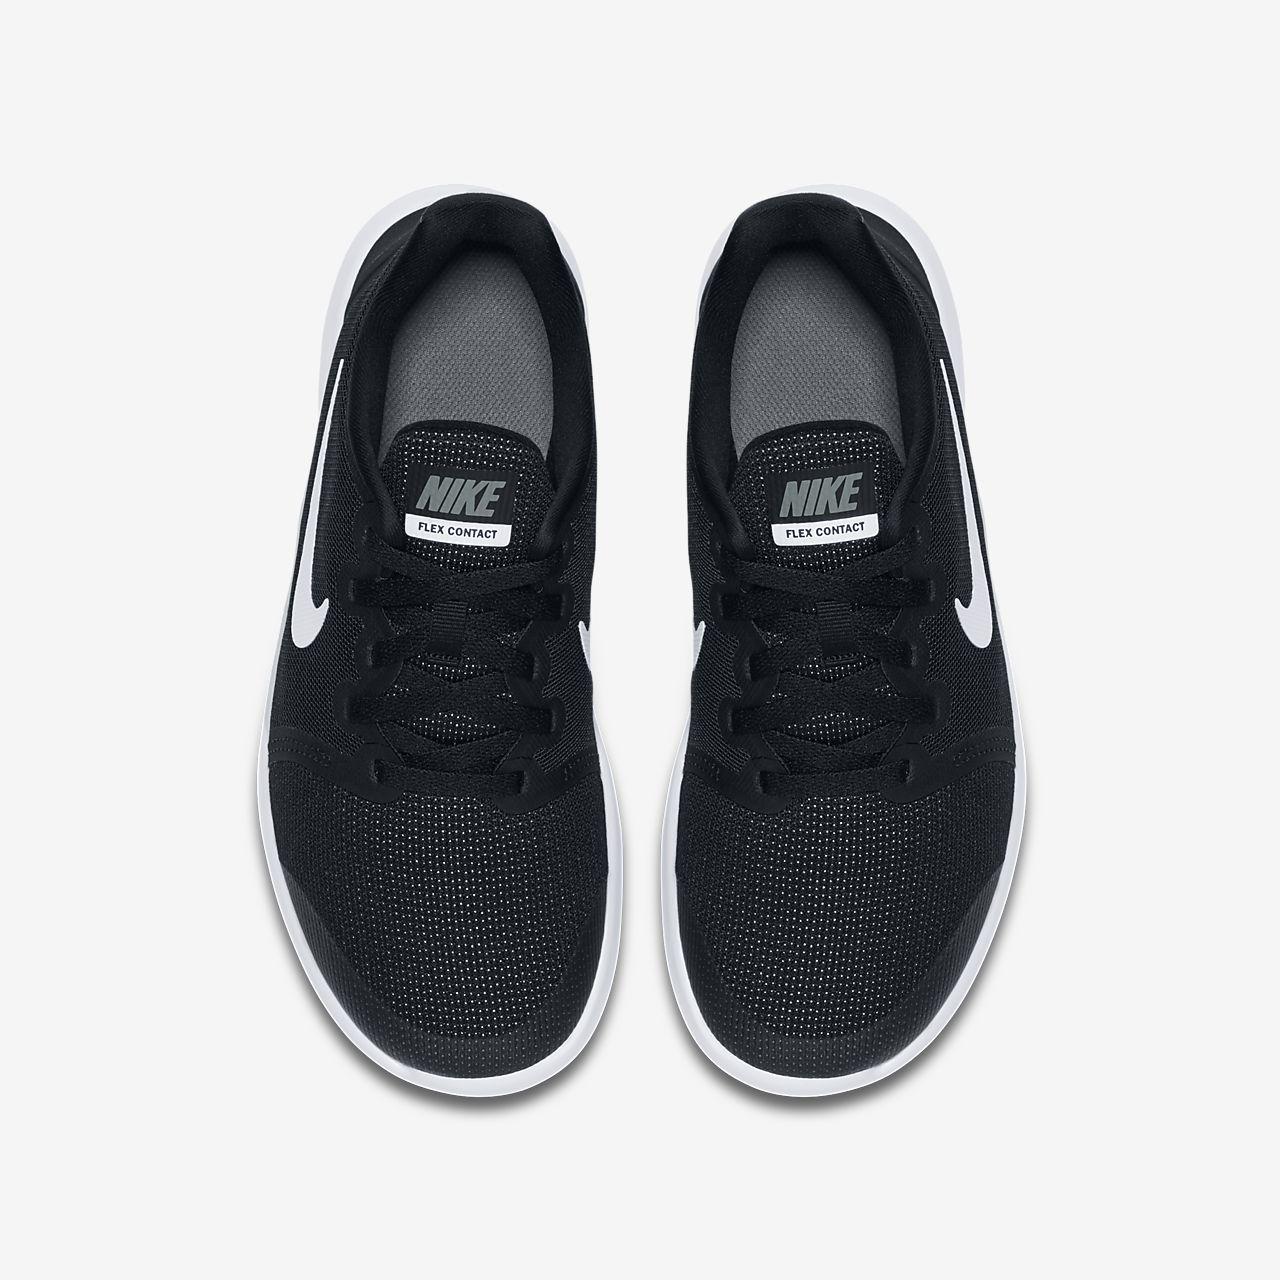 new arrival a0ece 05444 ... Löparsko Nike Flex Contact 2 för ungdom